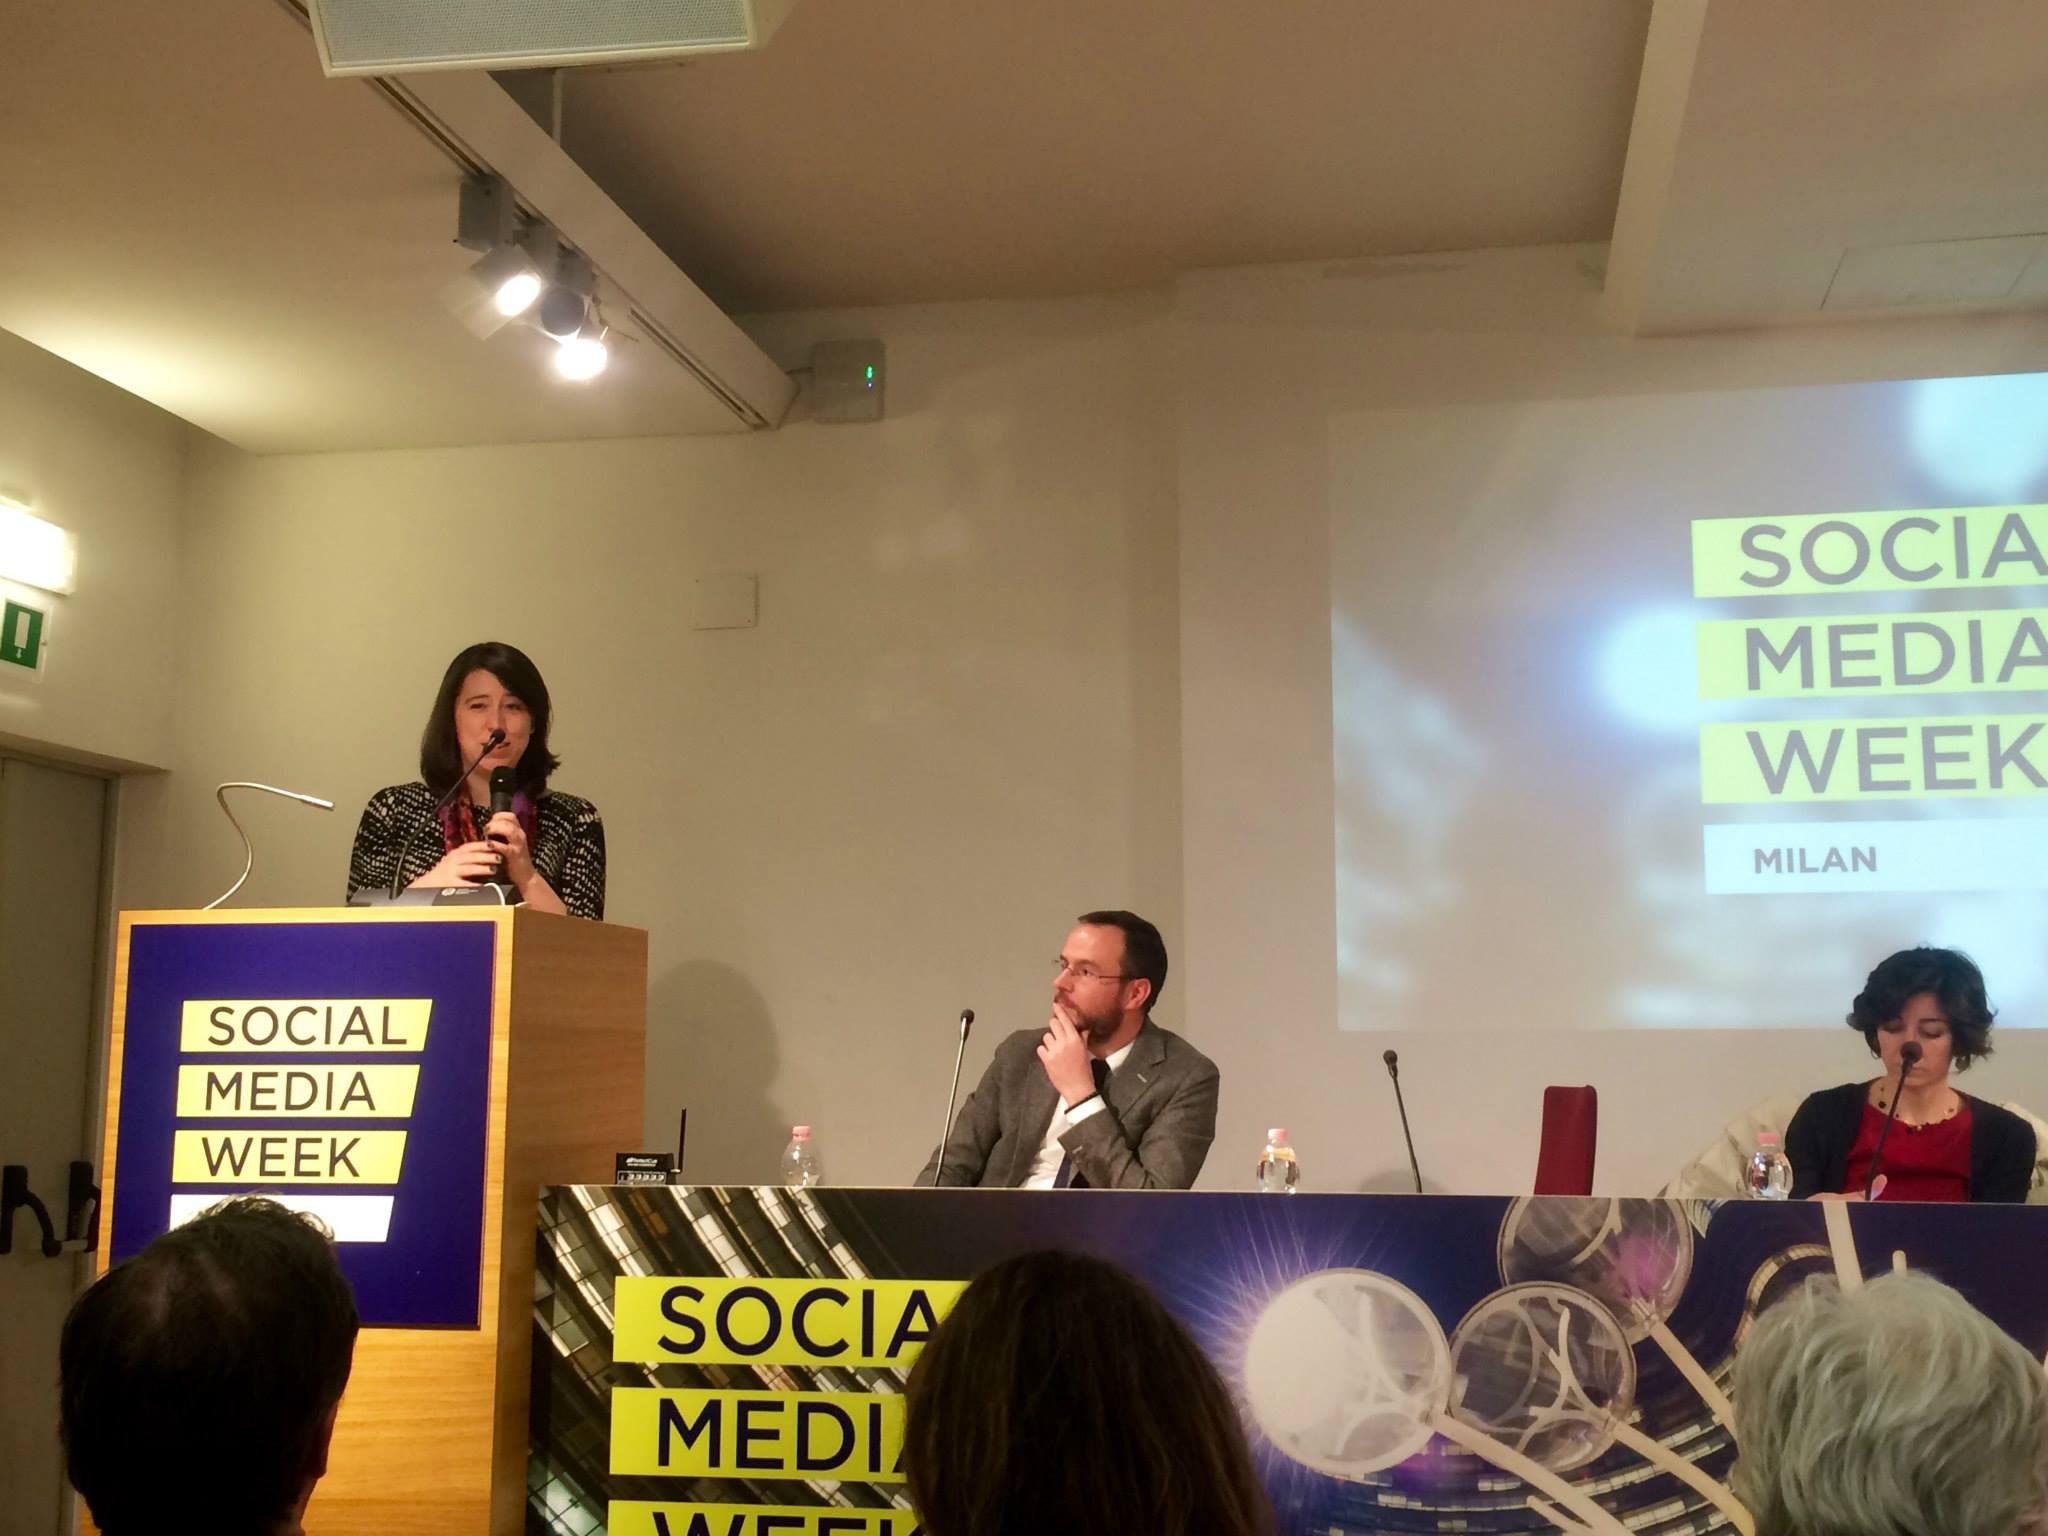 social_media_week_milano_politica